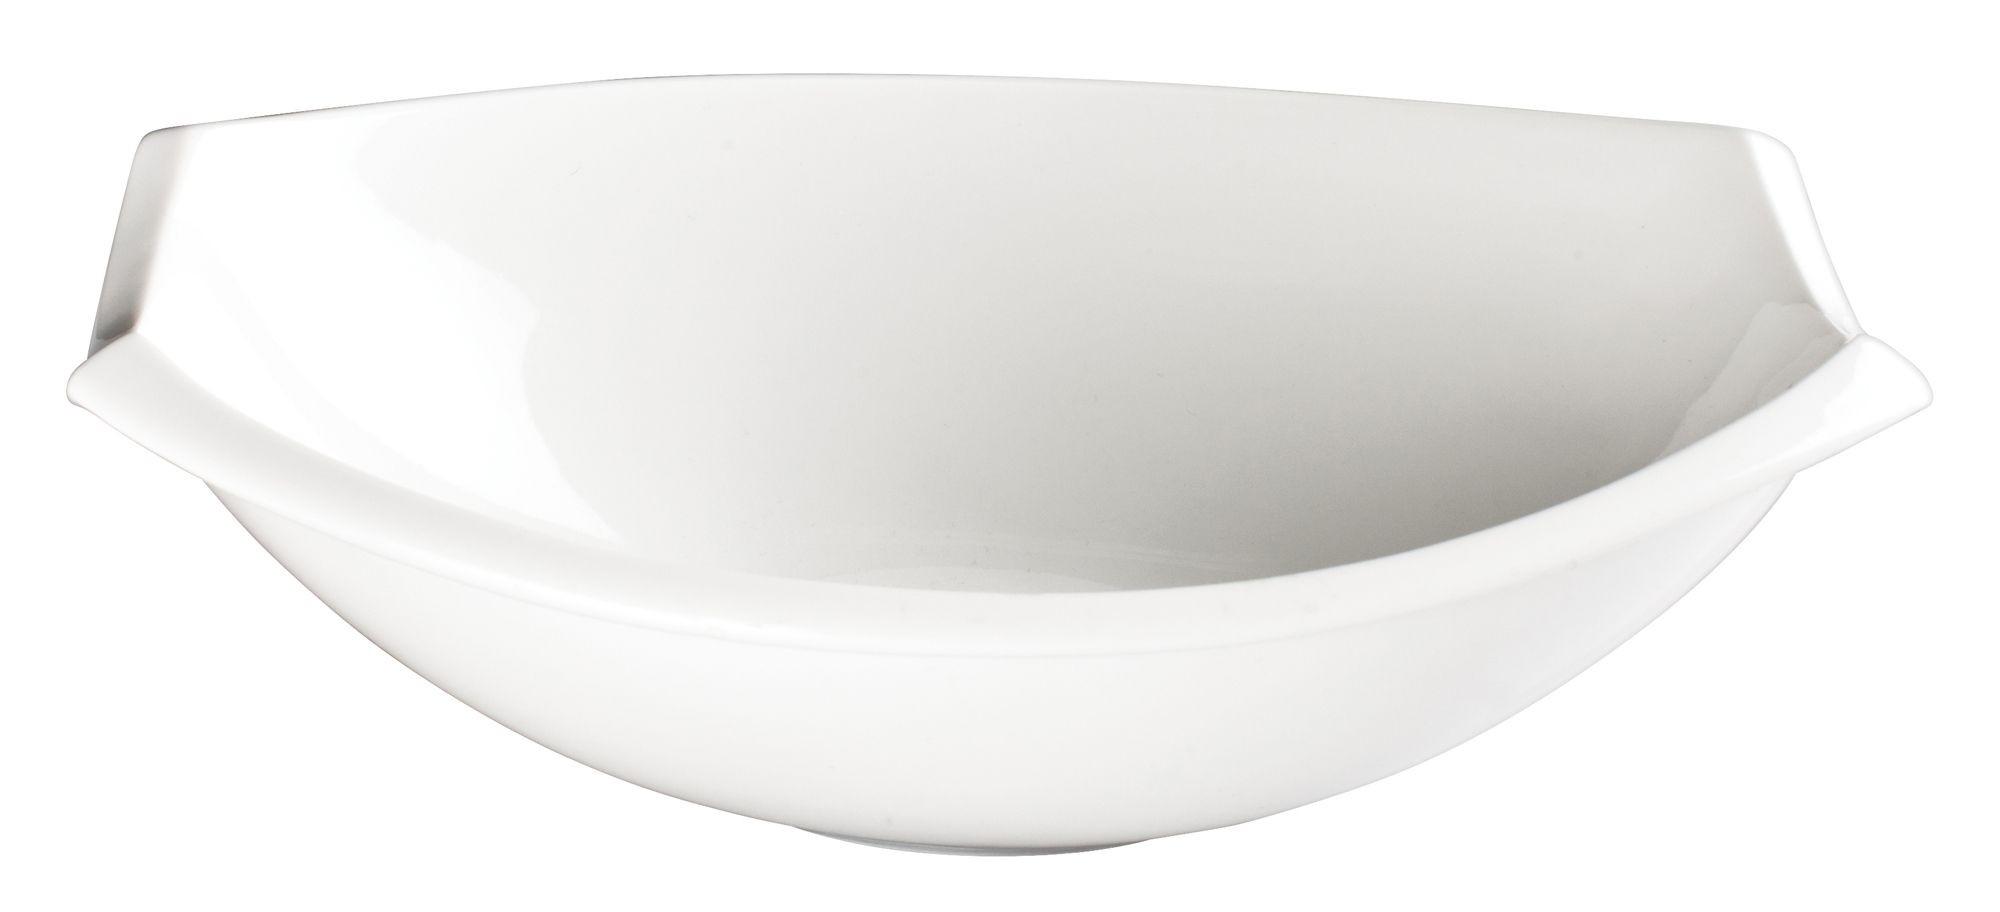 "Winco WDP006-205 Bergomi Creamy White Porcelain Oval Bowl 11"""